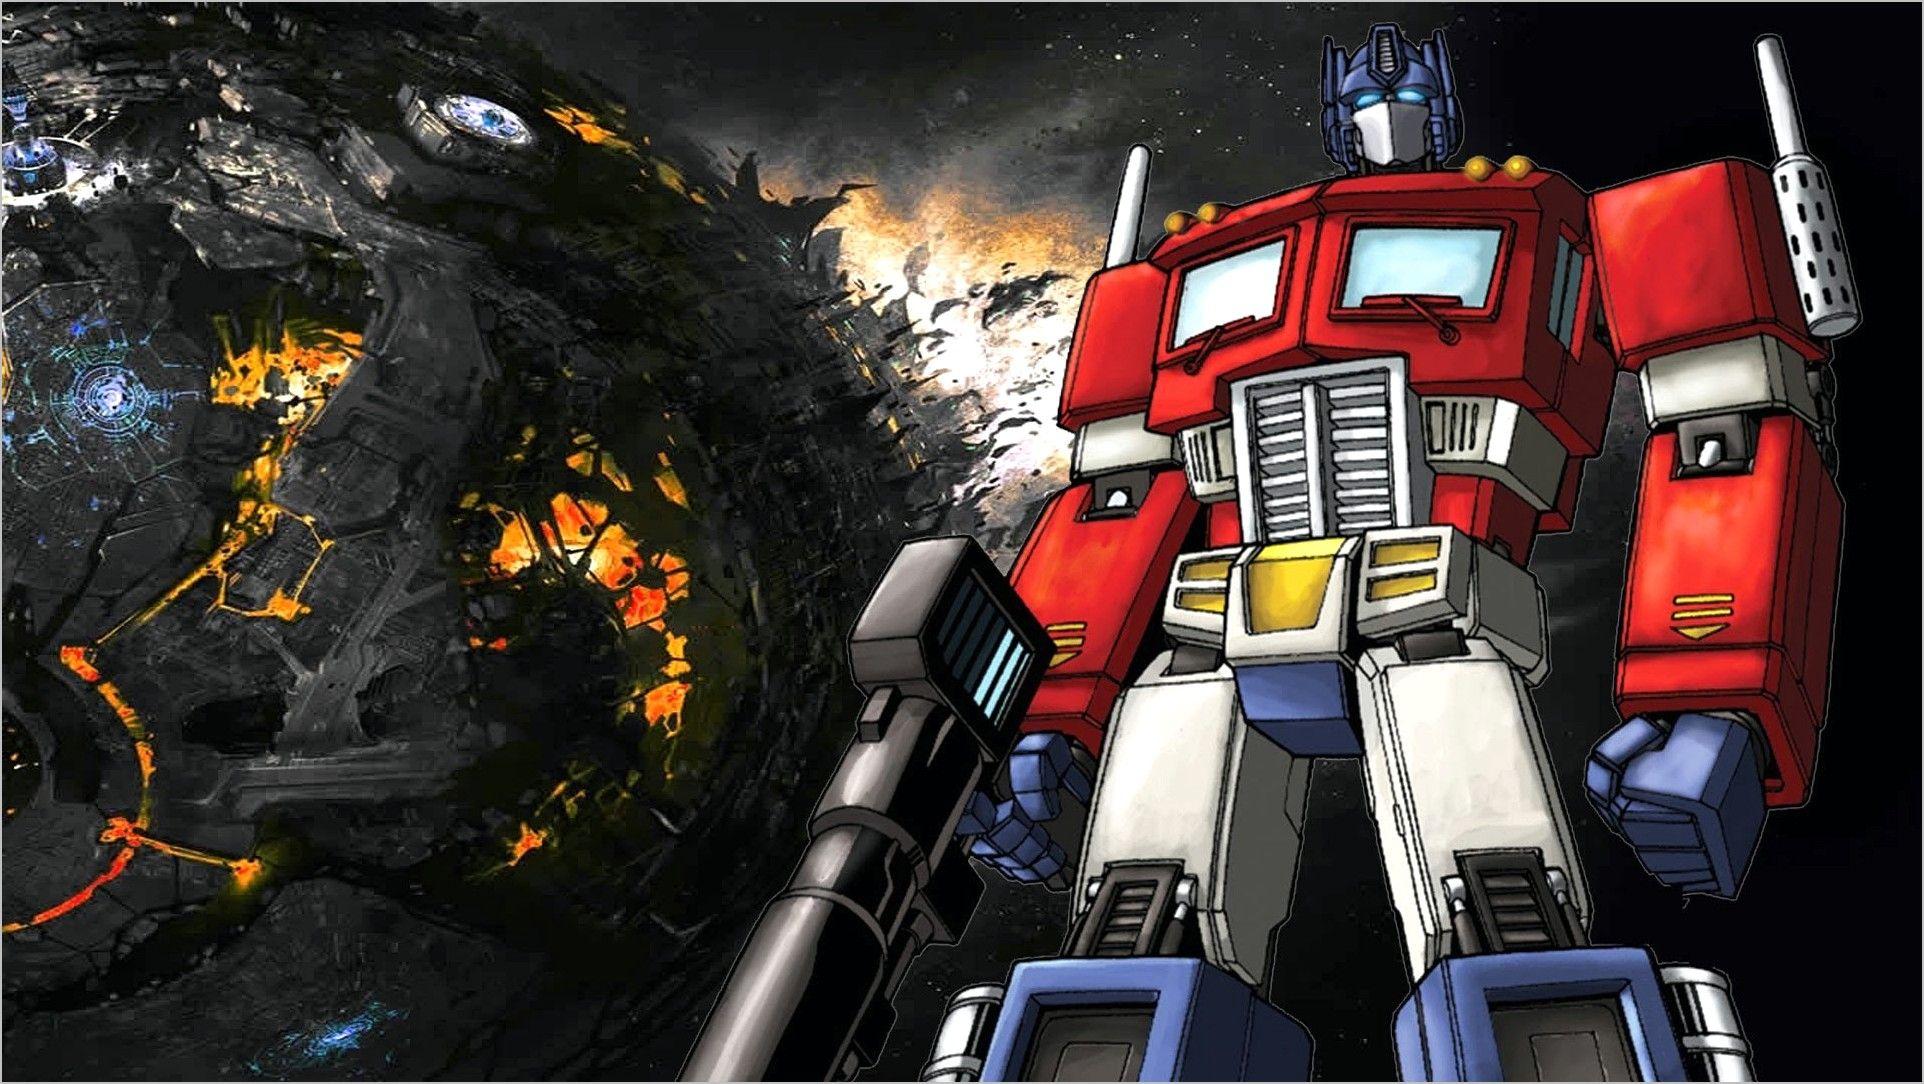 4k Wallpaper Transformers G1 In 2020 Transformers Wall Art Transformers Transformers Canvas